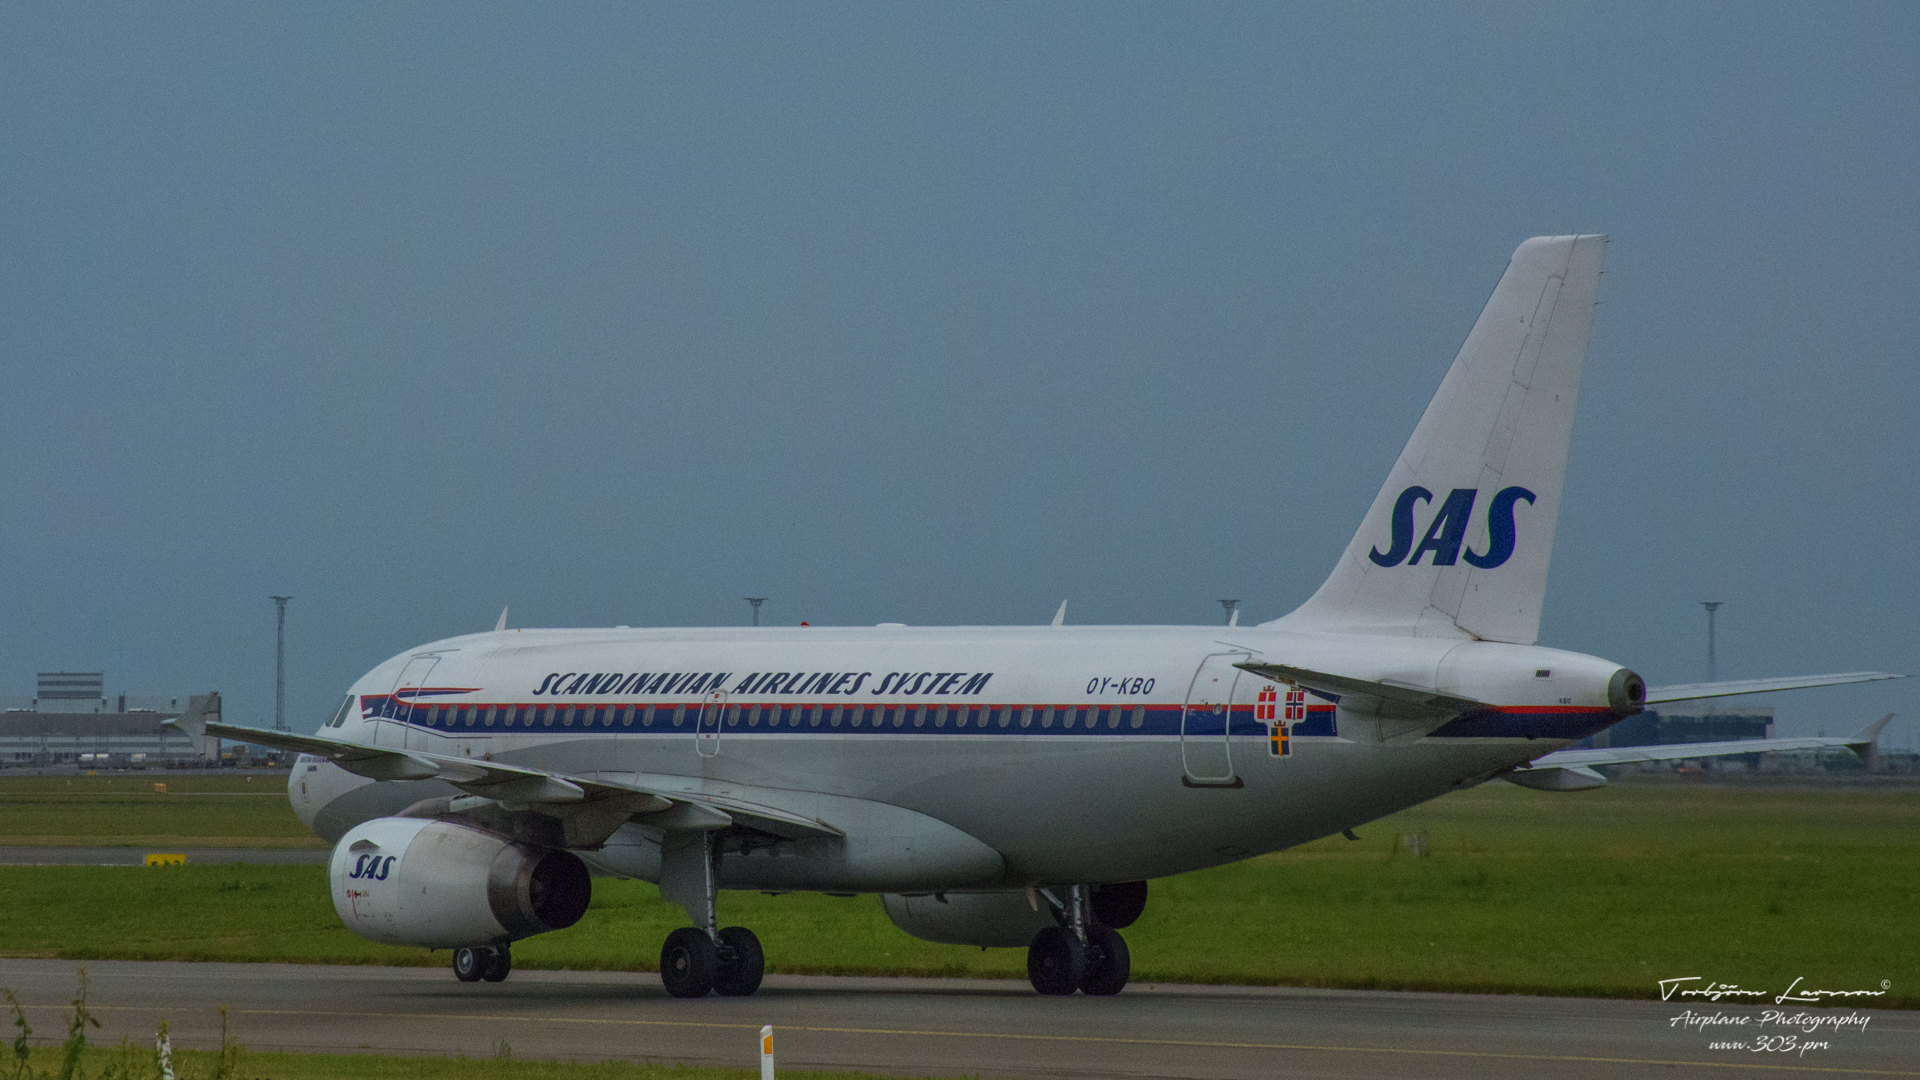 DSC_0793-Airbus A319-131 (OY-KBO) - SAS Scandinavian Airlines (Retro)